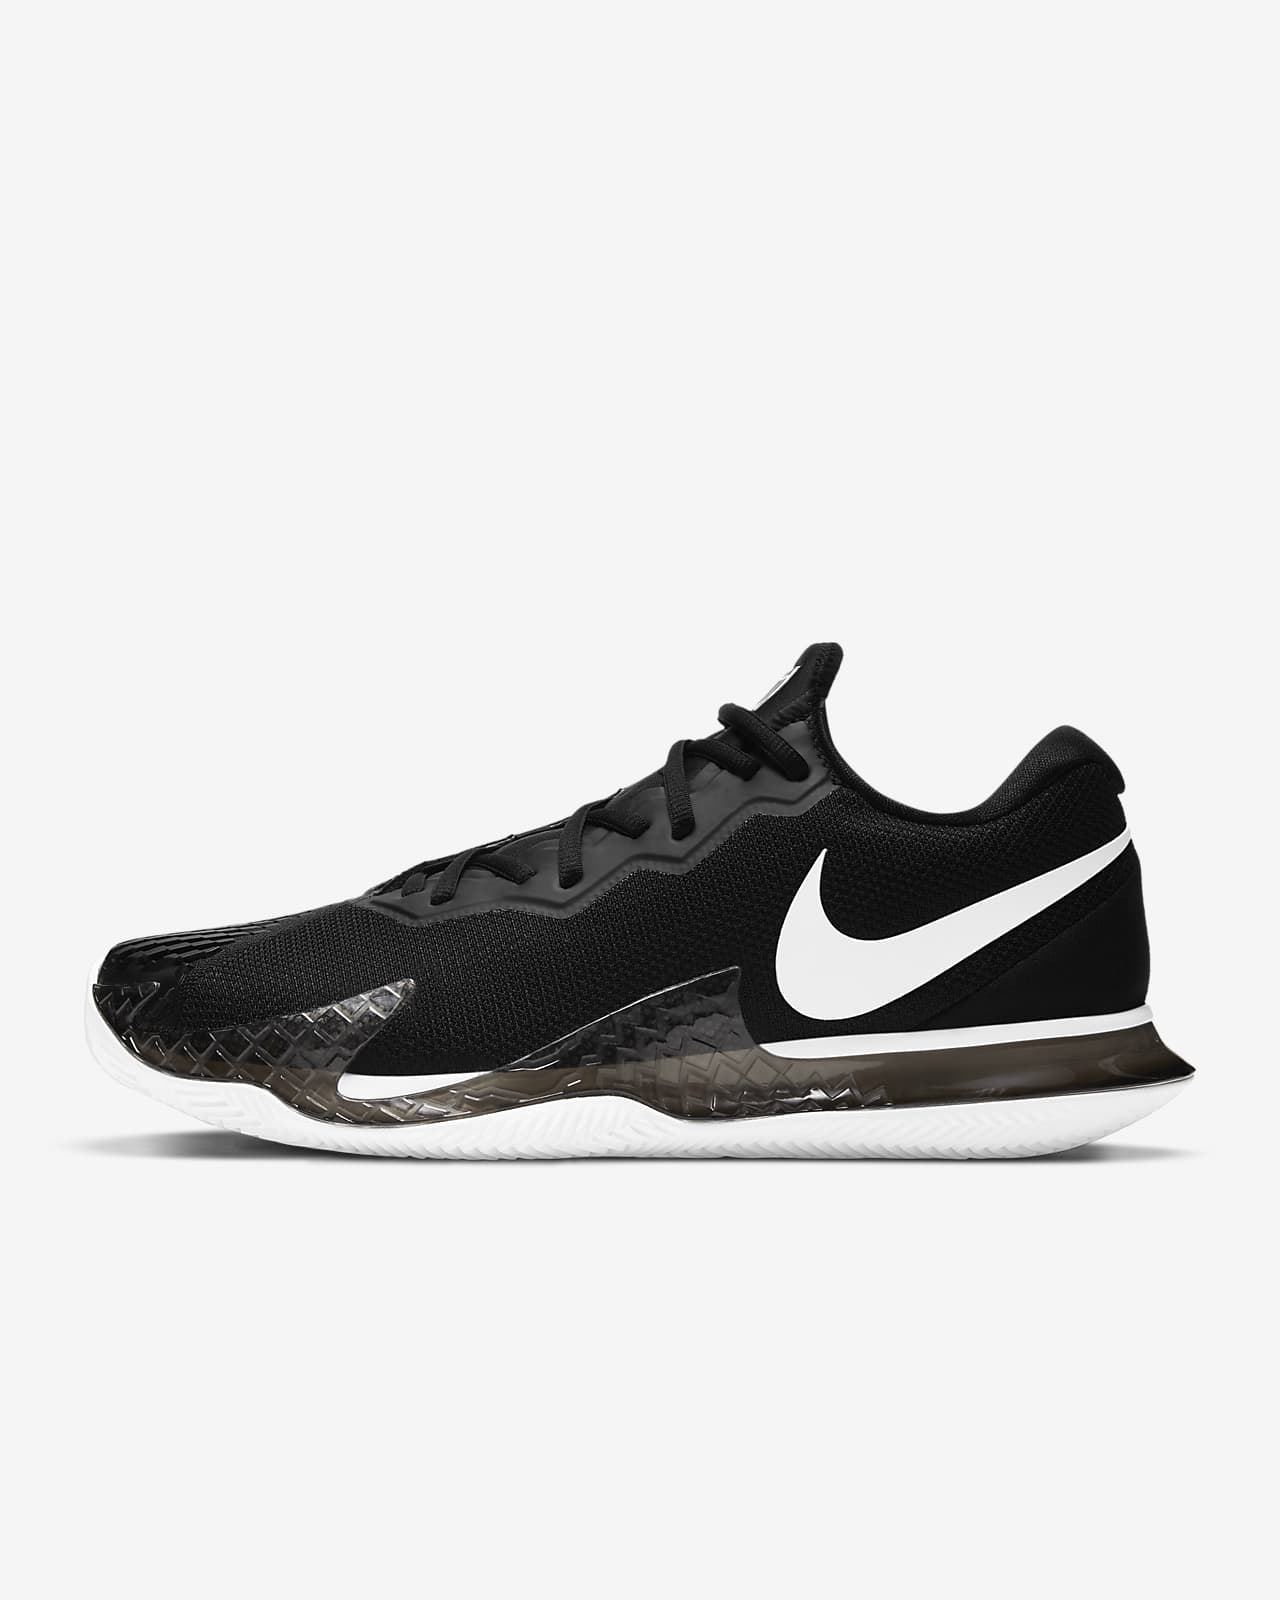 NikeCourt Air Zoom Vapor Cage 4 Men's Clay Tennis Shoe. Nike LU